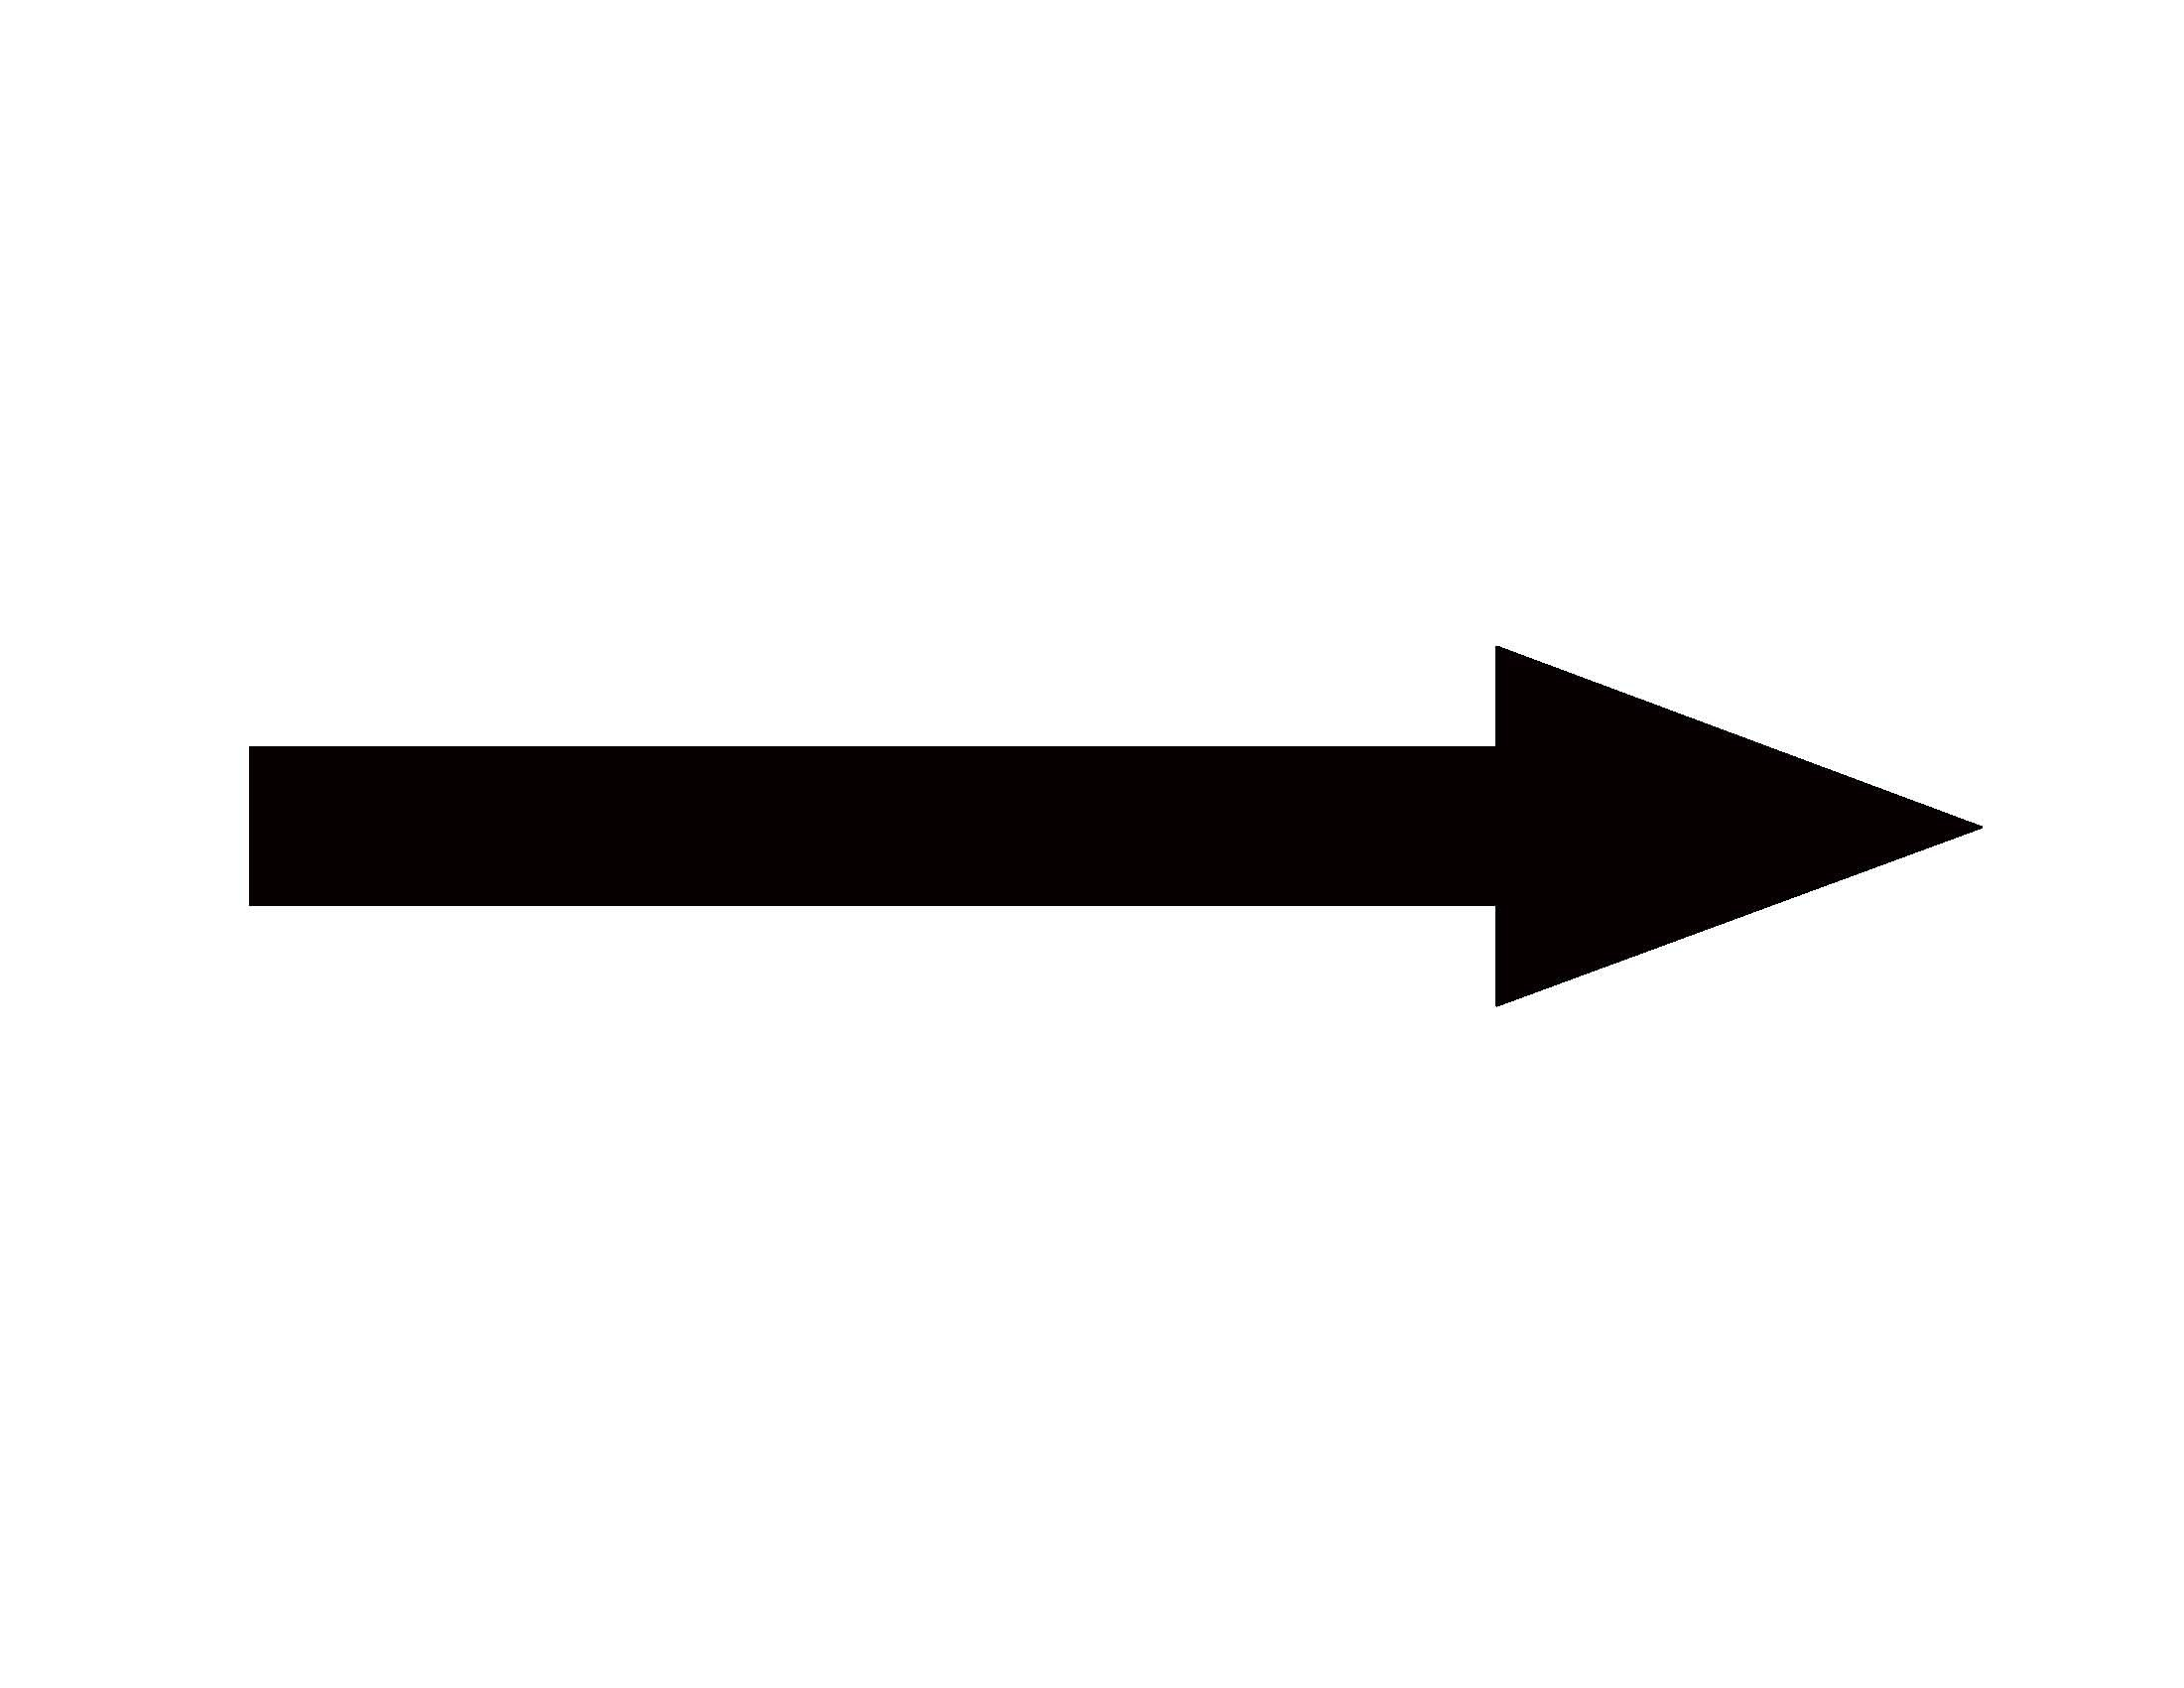 Arrows Clipart #11862